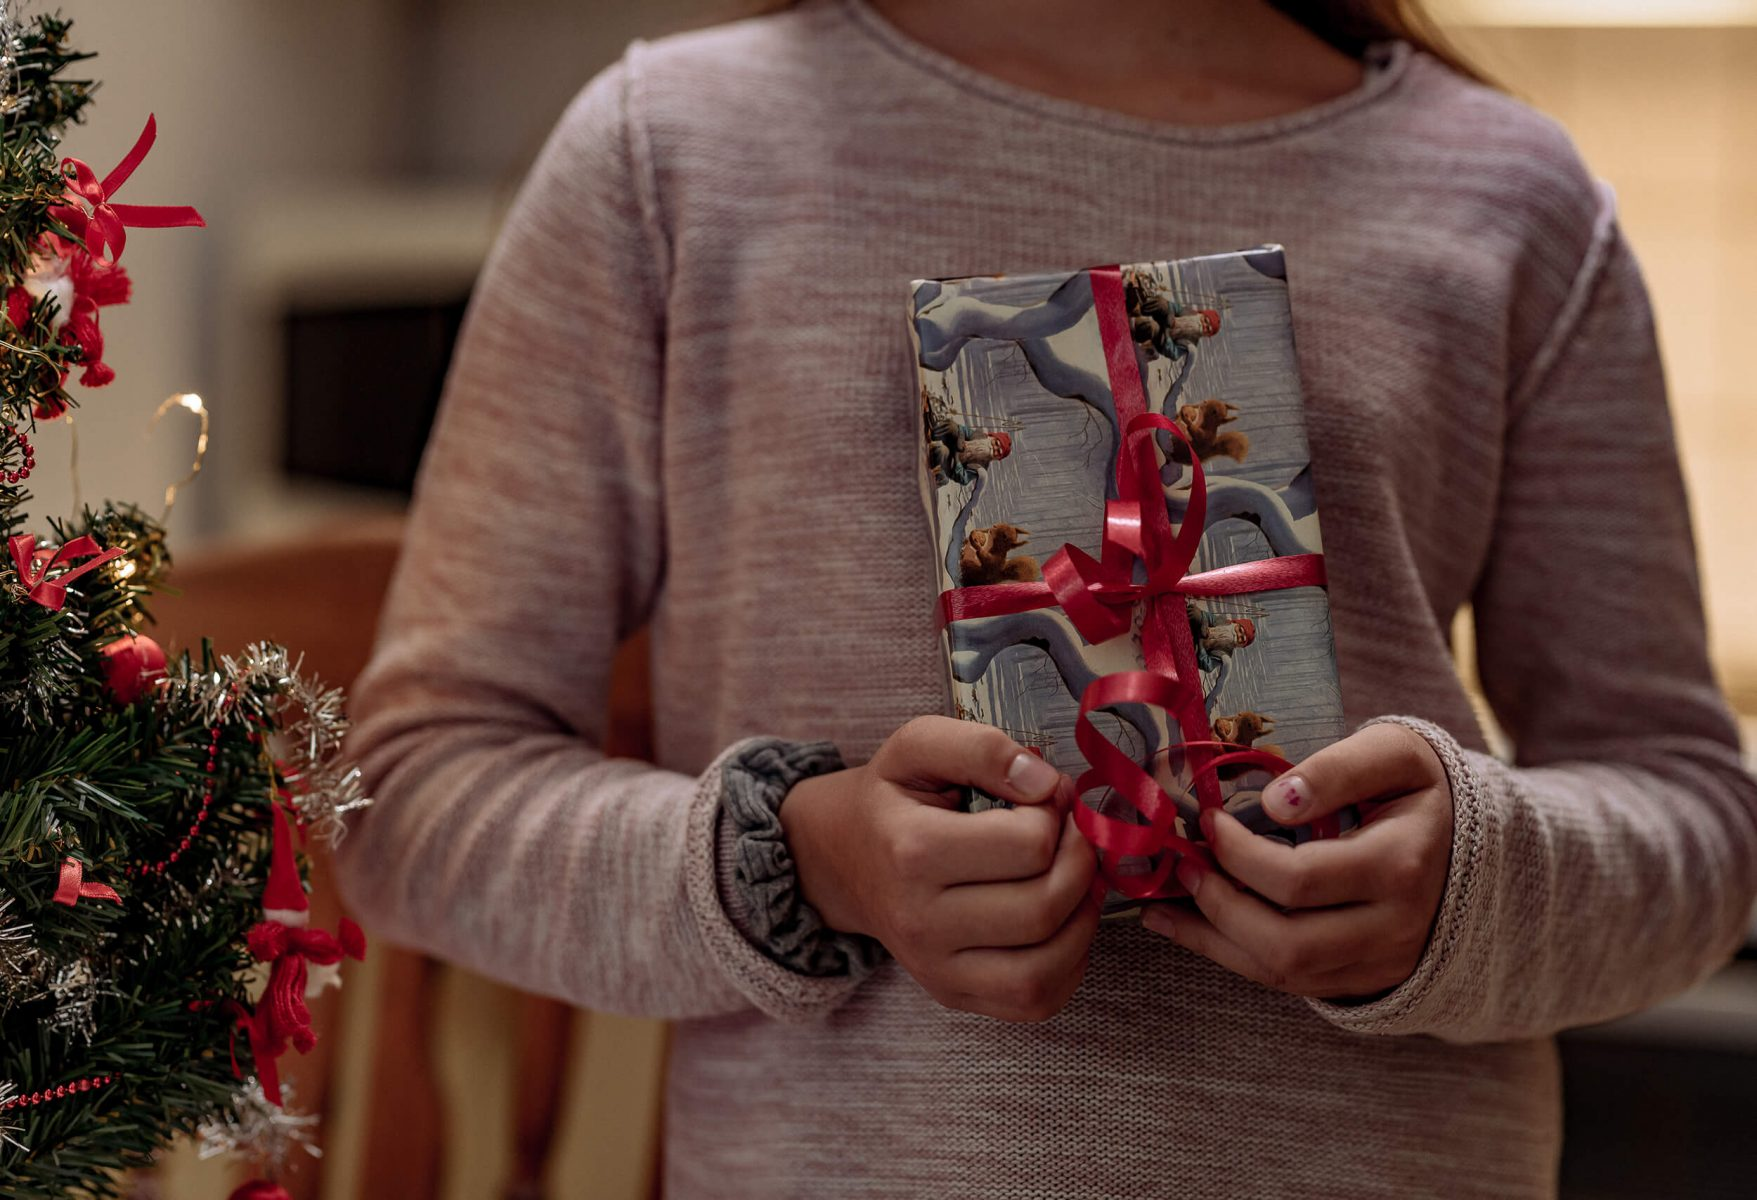 Kid holding a Christmas gift.